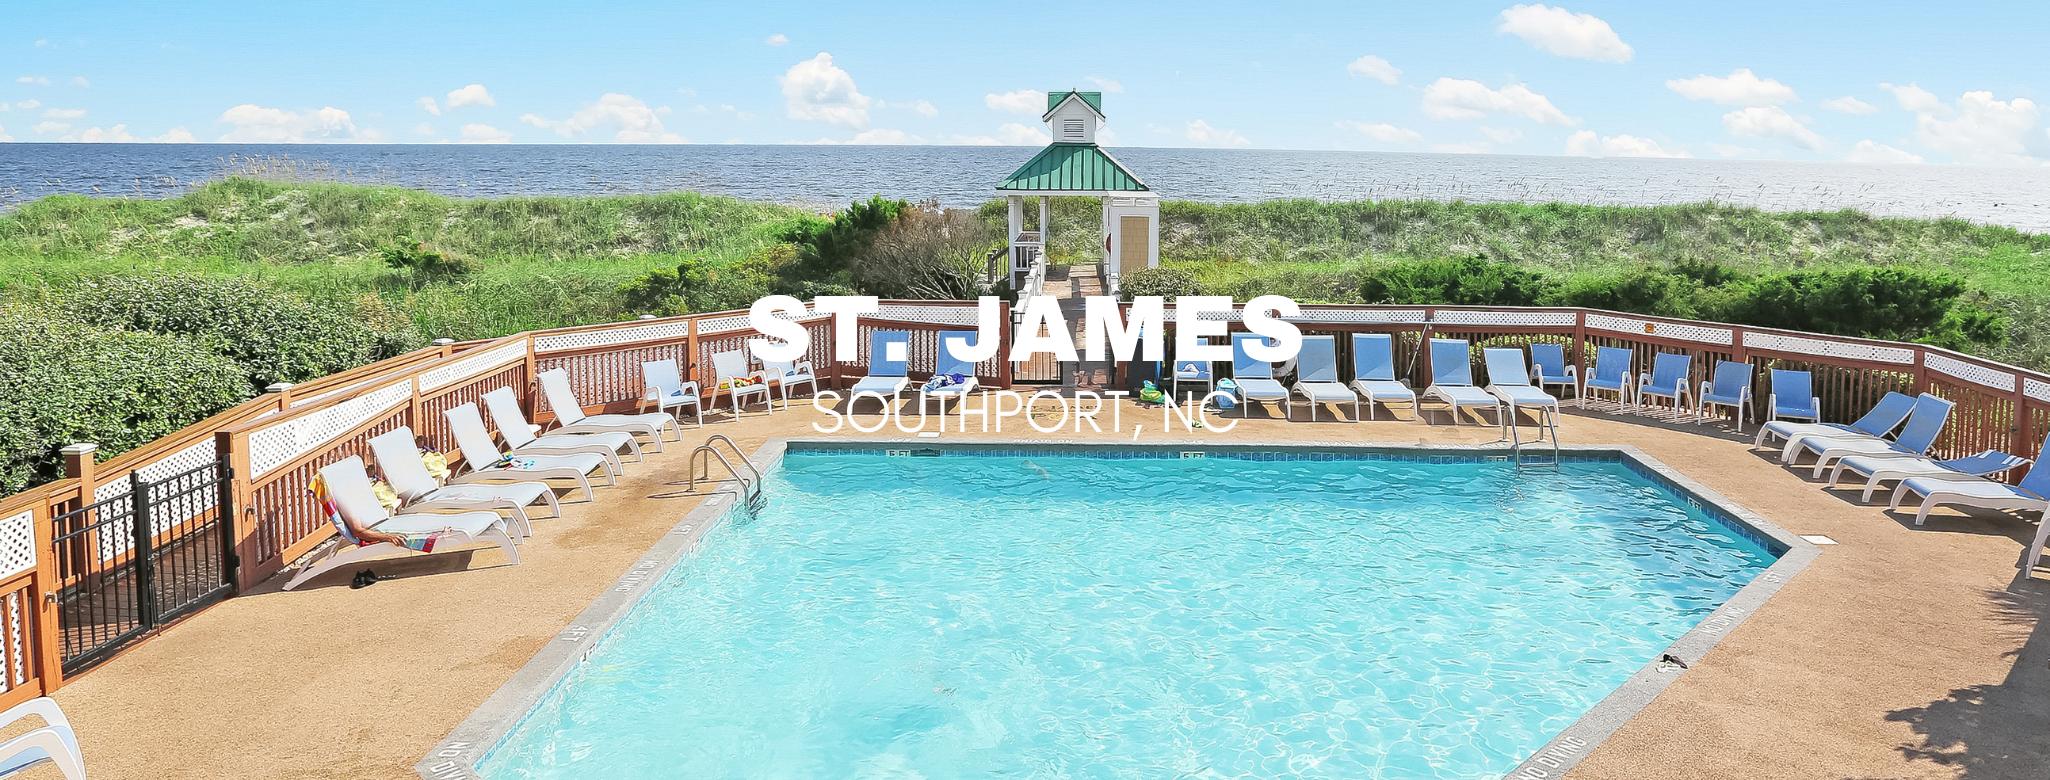 ST JAMES • SOUTHPORT NC